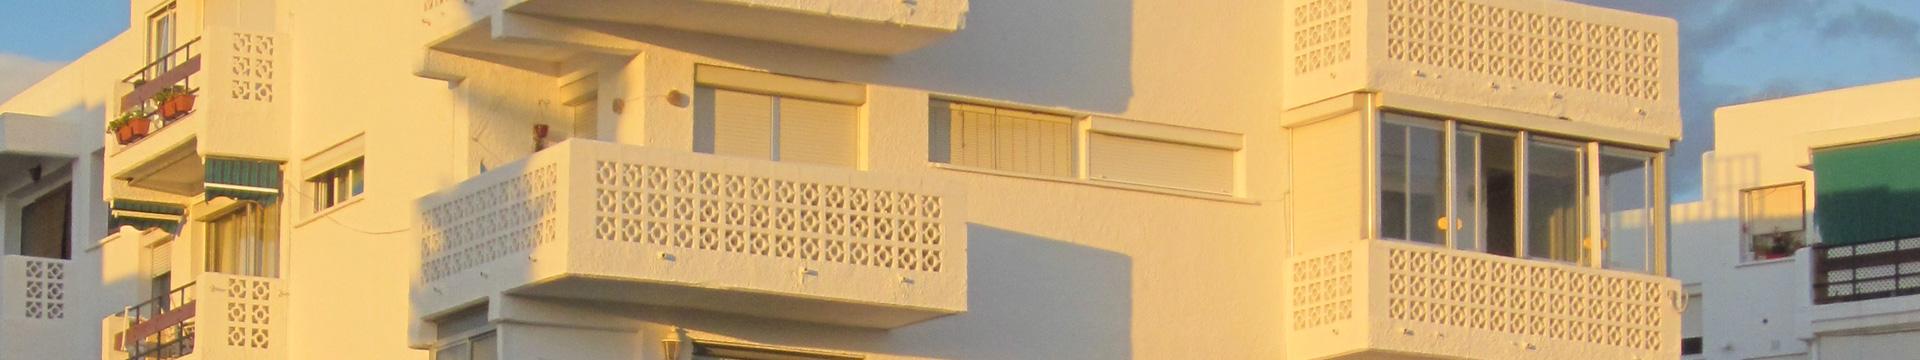 Ремонт на тераси